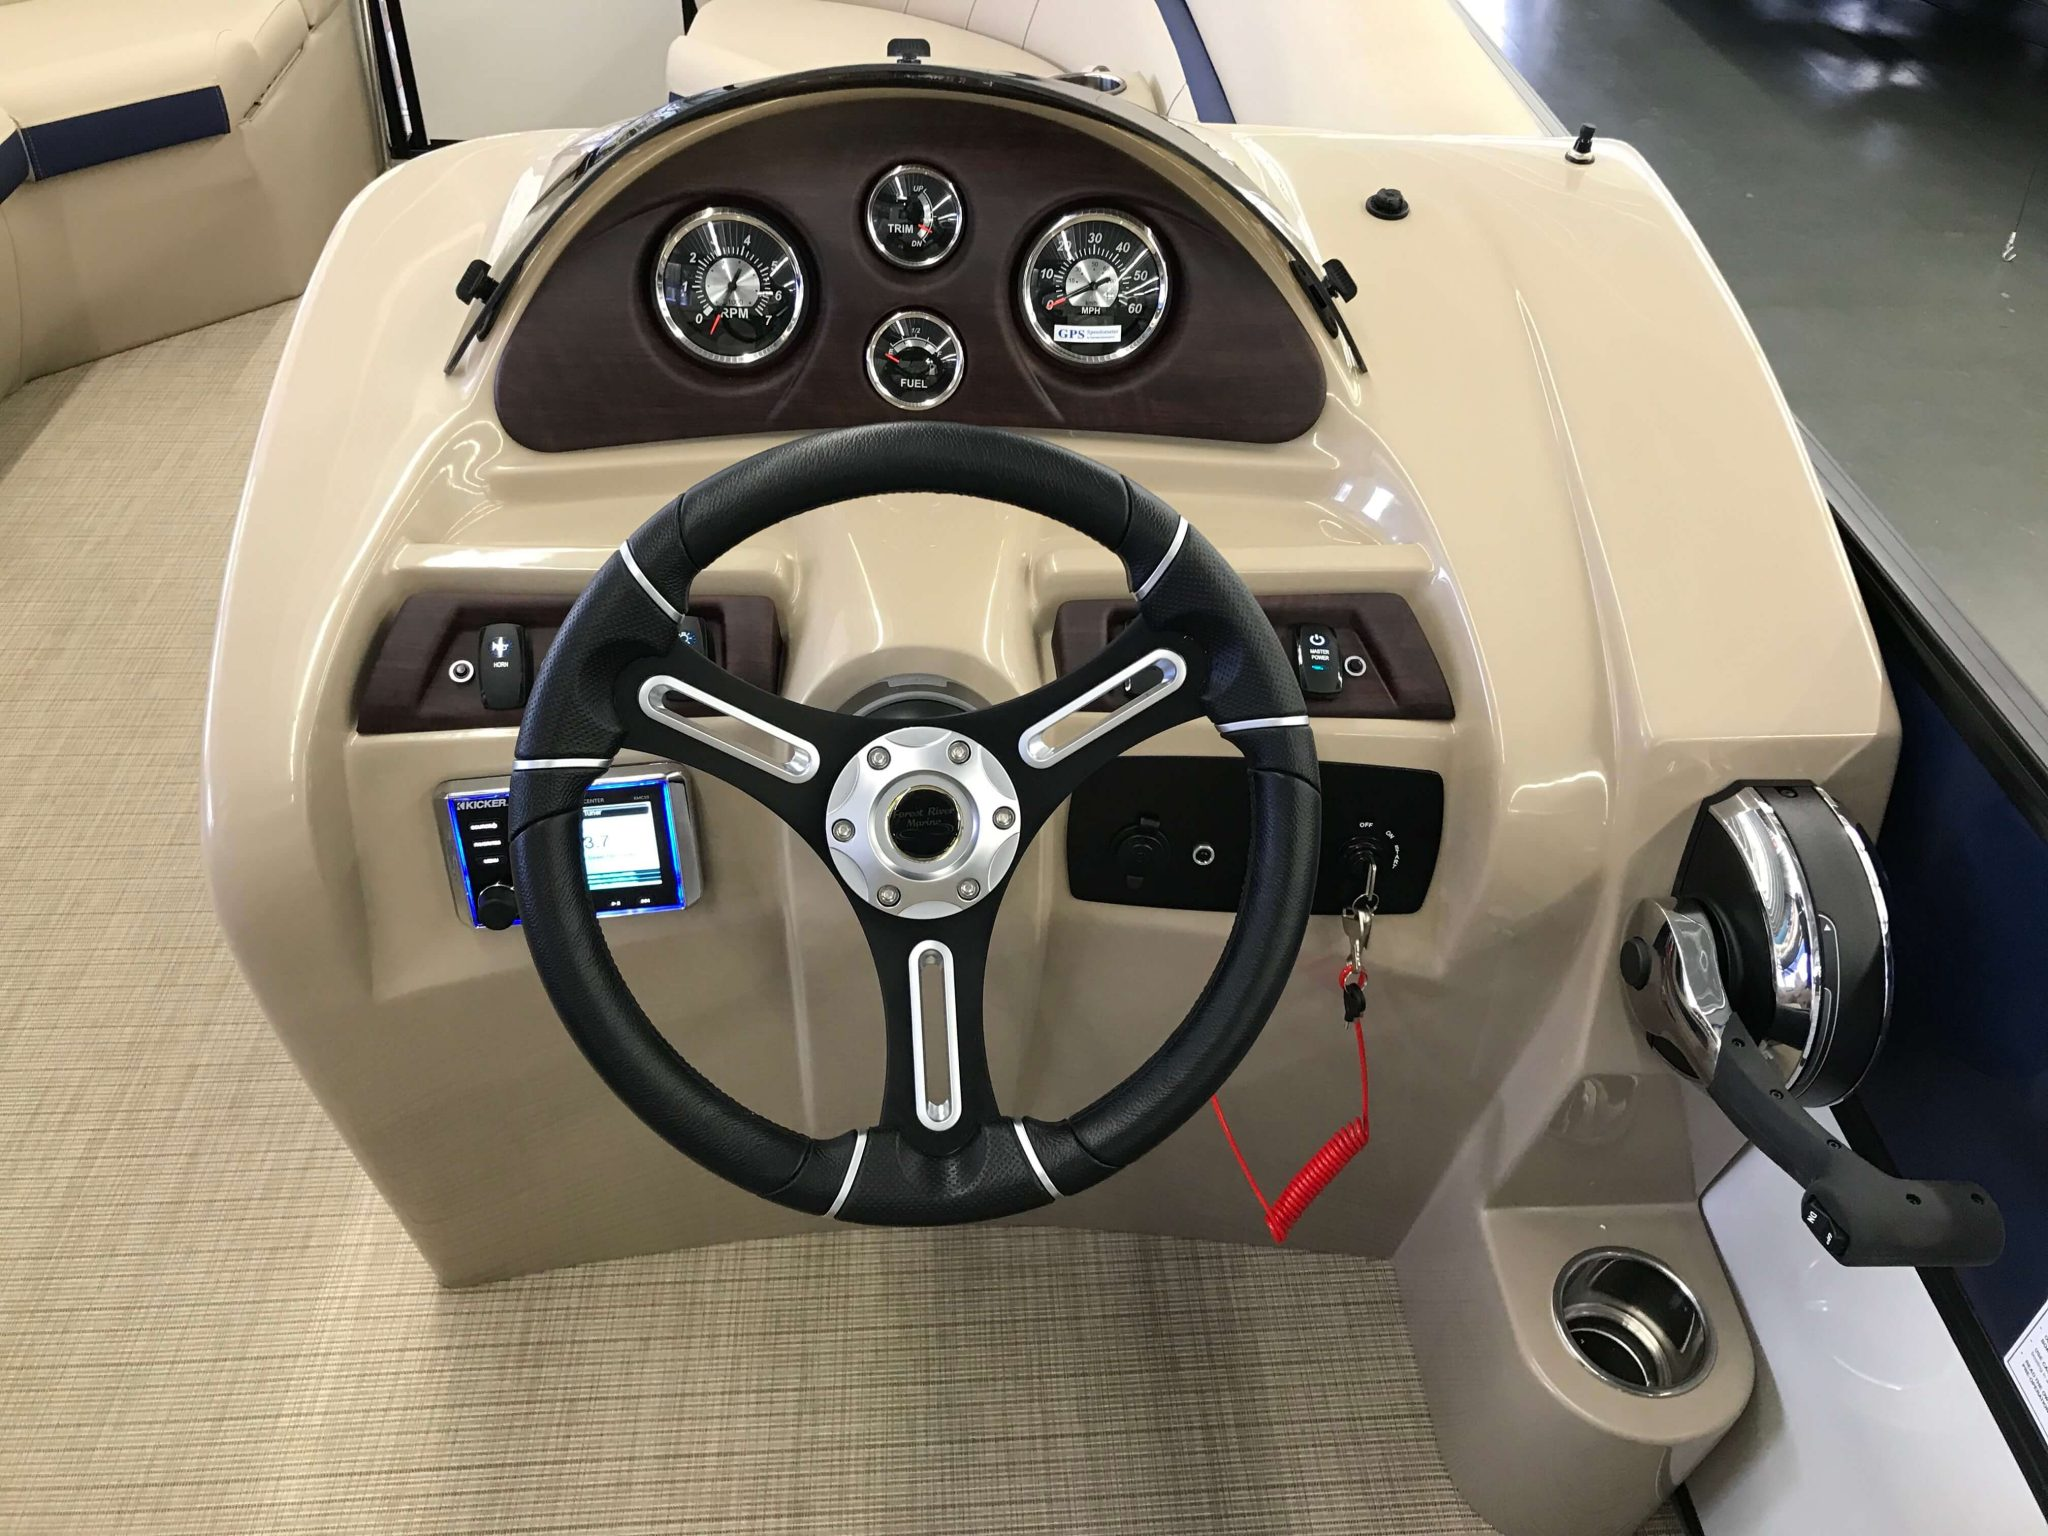 2019 Berkshire 24RFX CTS 3.0 Tritoon Helm And Dash